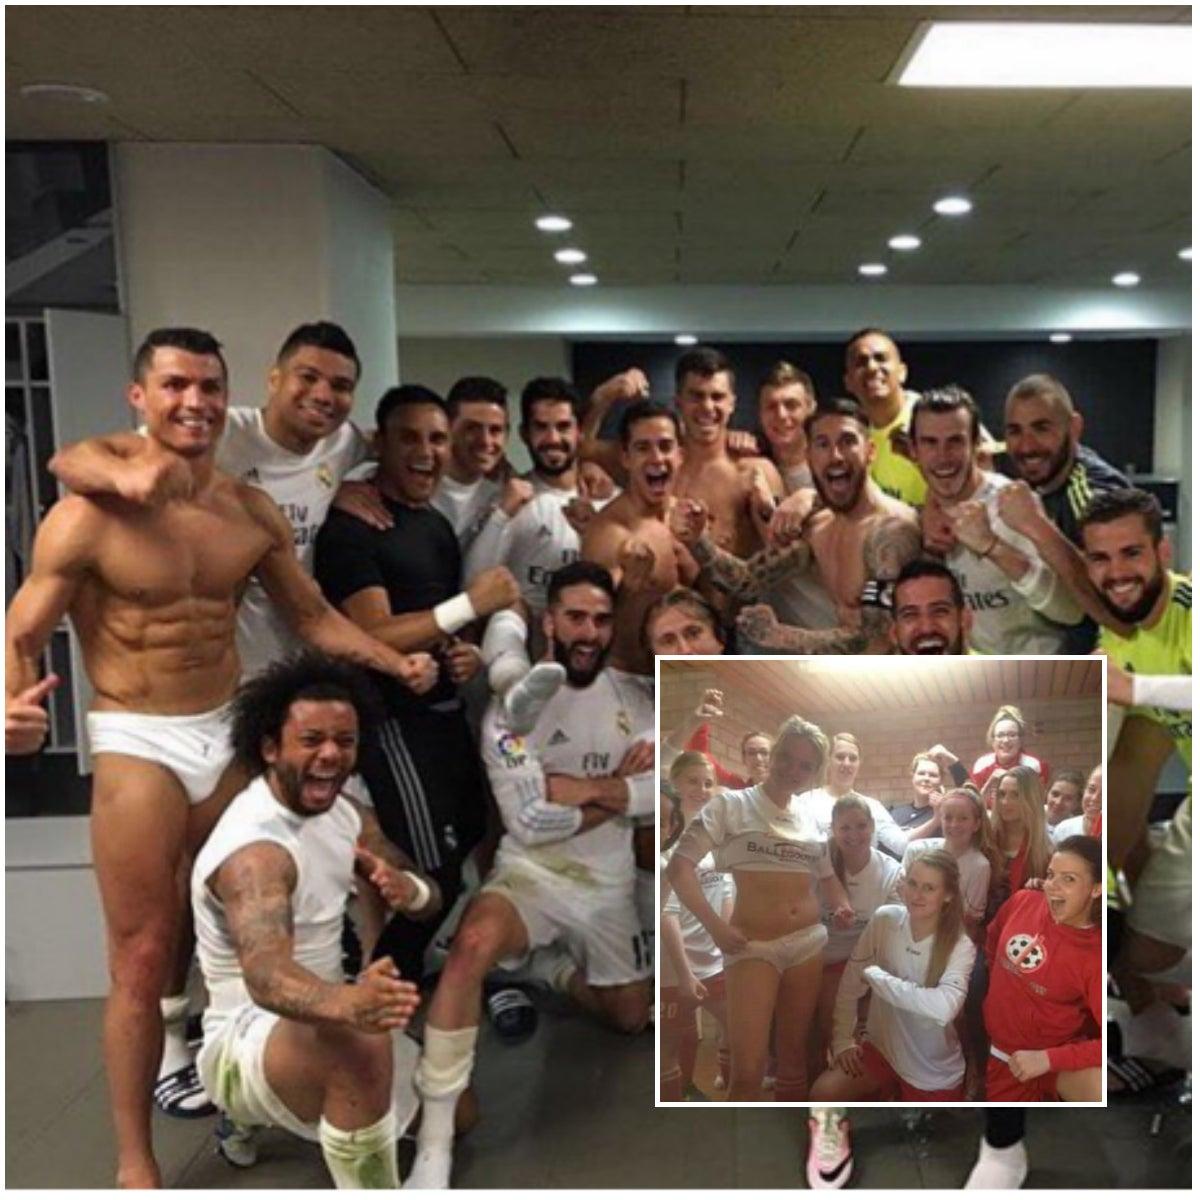 Equipo de fútbol femenino celebra al estilo del Real Madrid